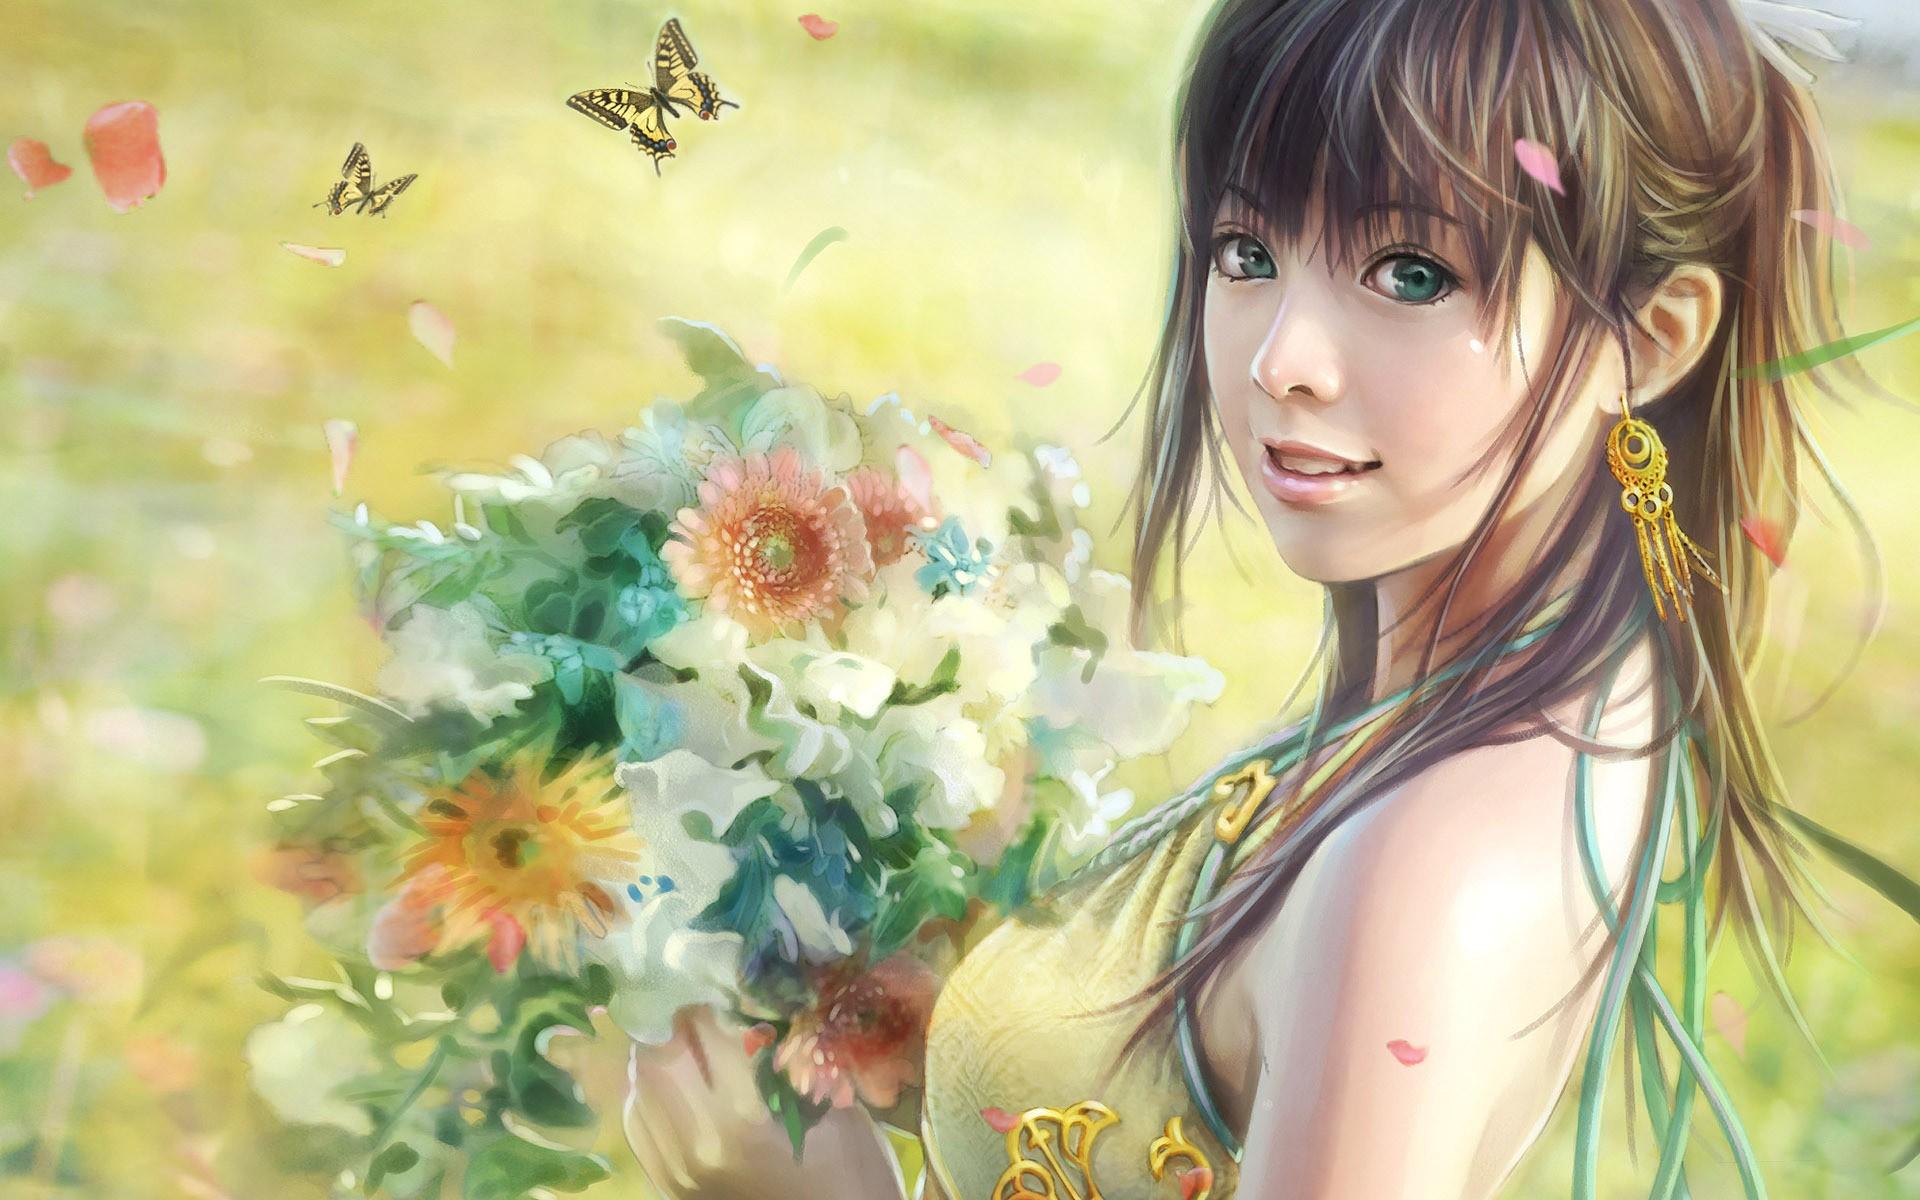 General 1920x1200 anime digital art drawing fantasy art flowers